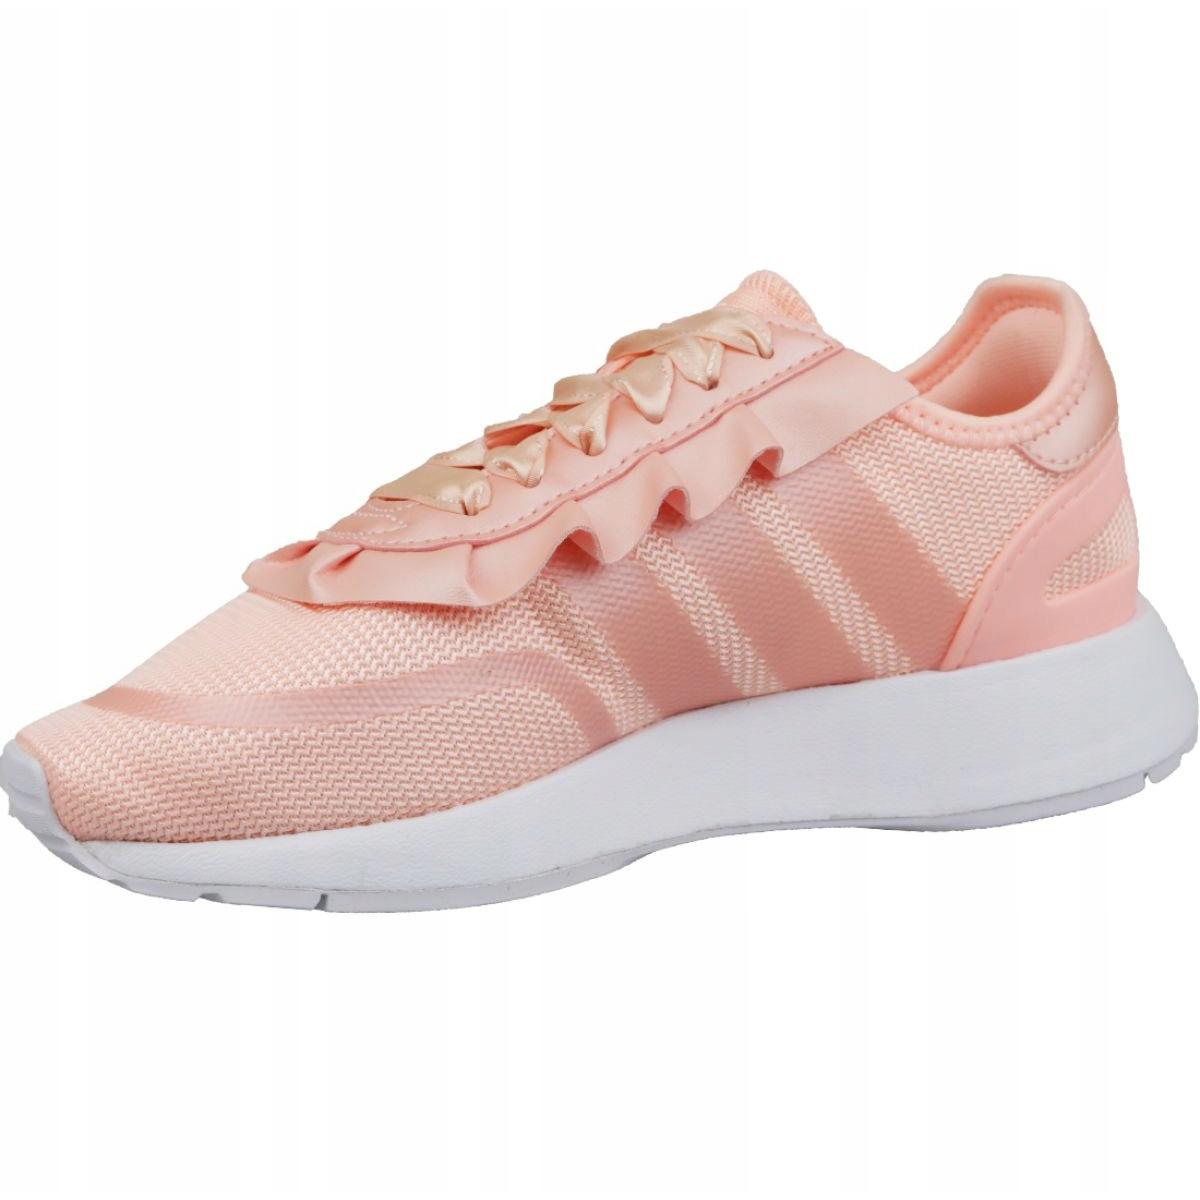 Adidas N 5923 Jr Db3580 Shoes Pink